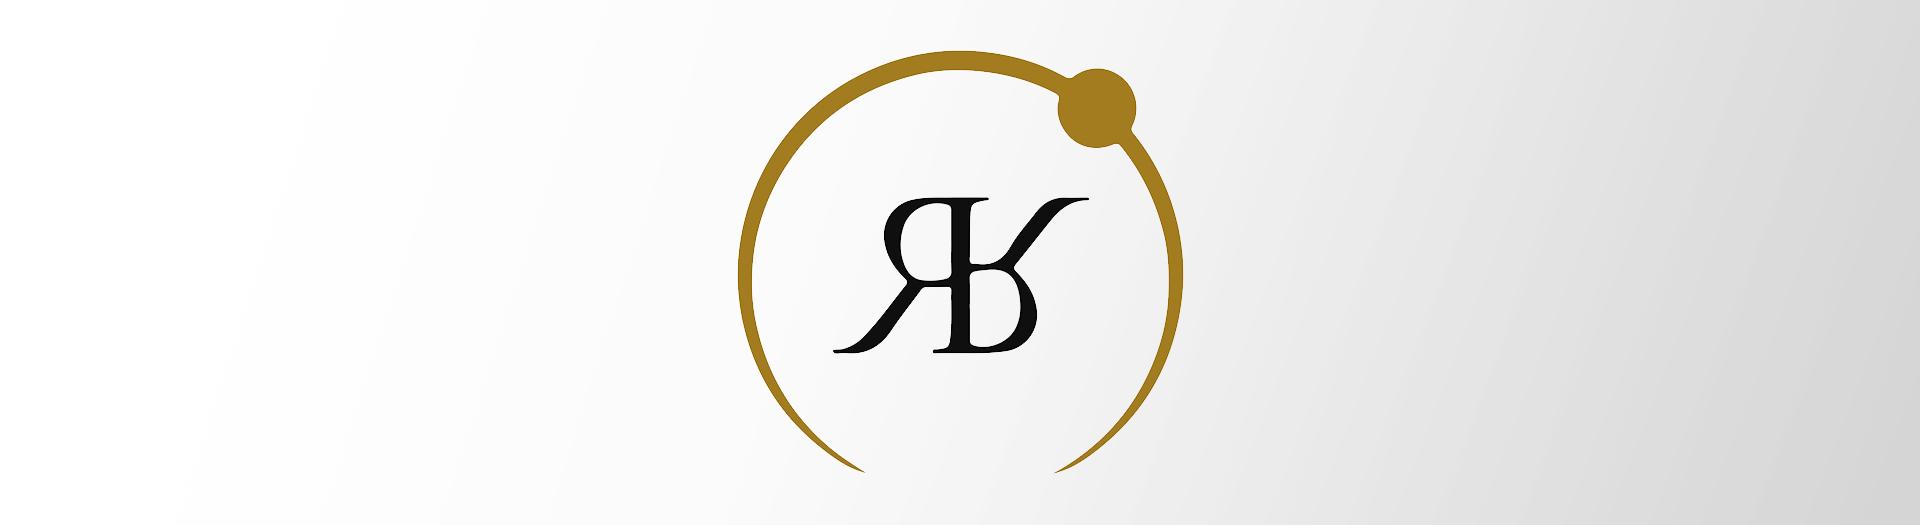 slideshow-logo